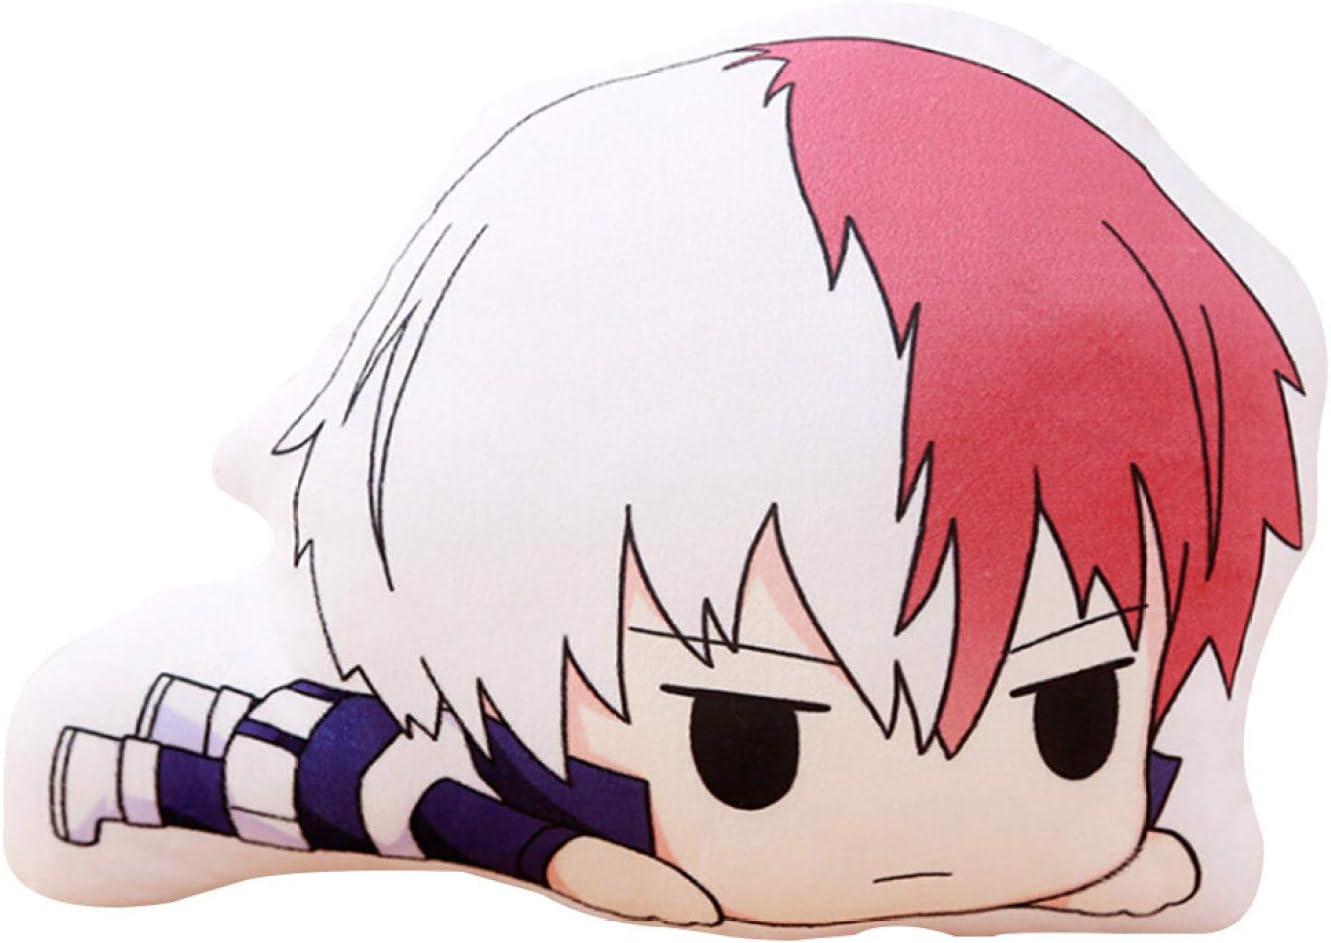 XINGSd Impeccable My Hero Academia Animation um Pl/üsch Kissen Asui Tsuyu Anime Cartoon Bild Kissen Anime Fans Geschenk S N//A Bakugou Katsuki